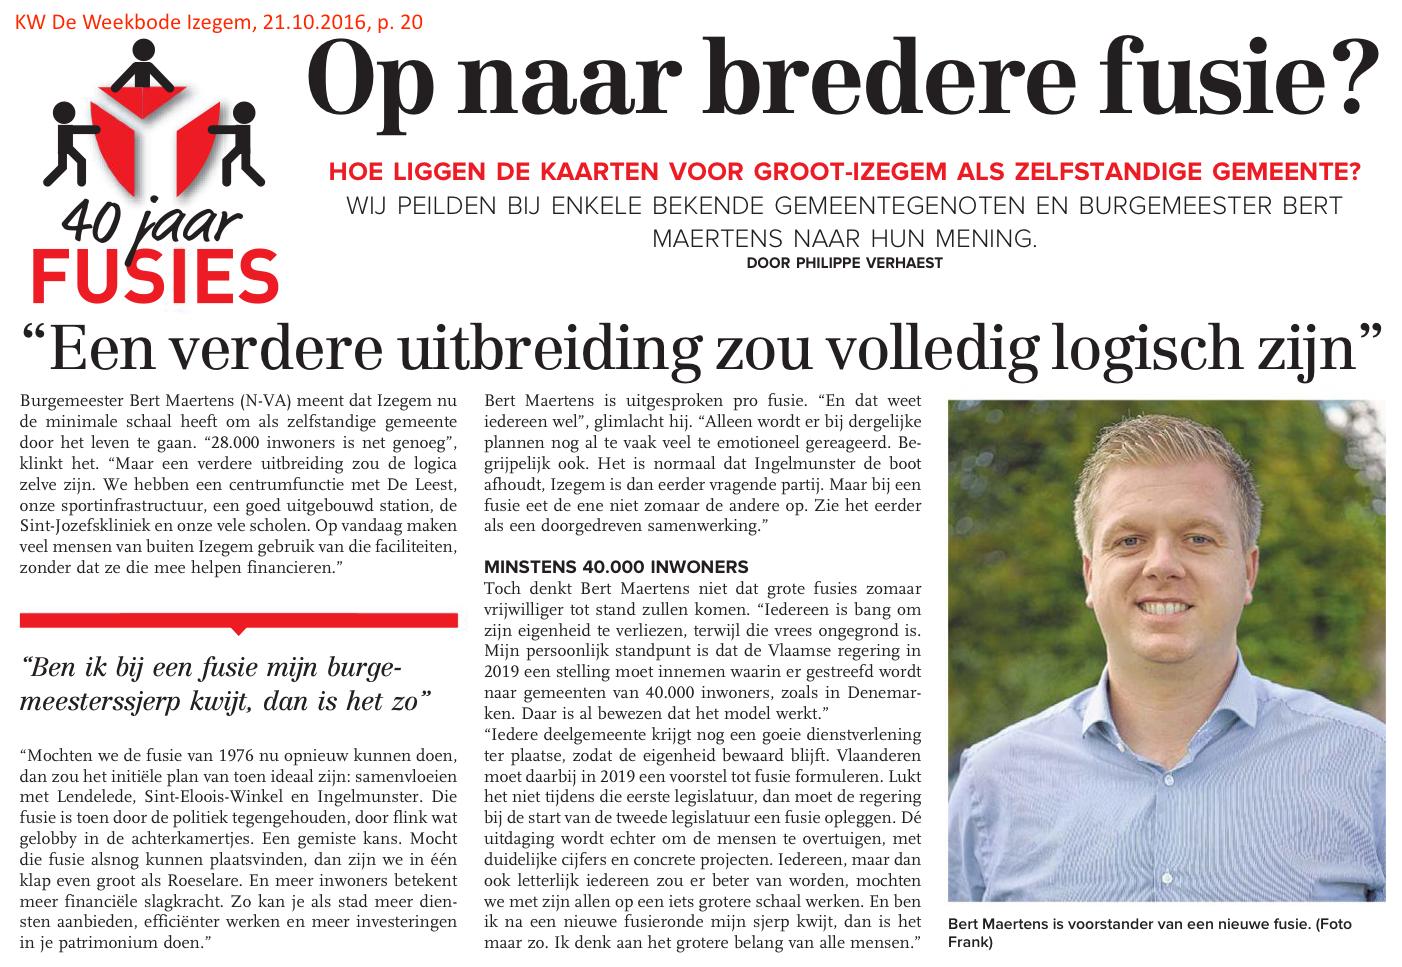 KW De Weekbode Izegem, 21.10.2016, p. 20